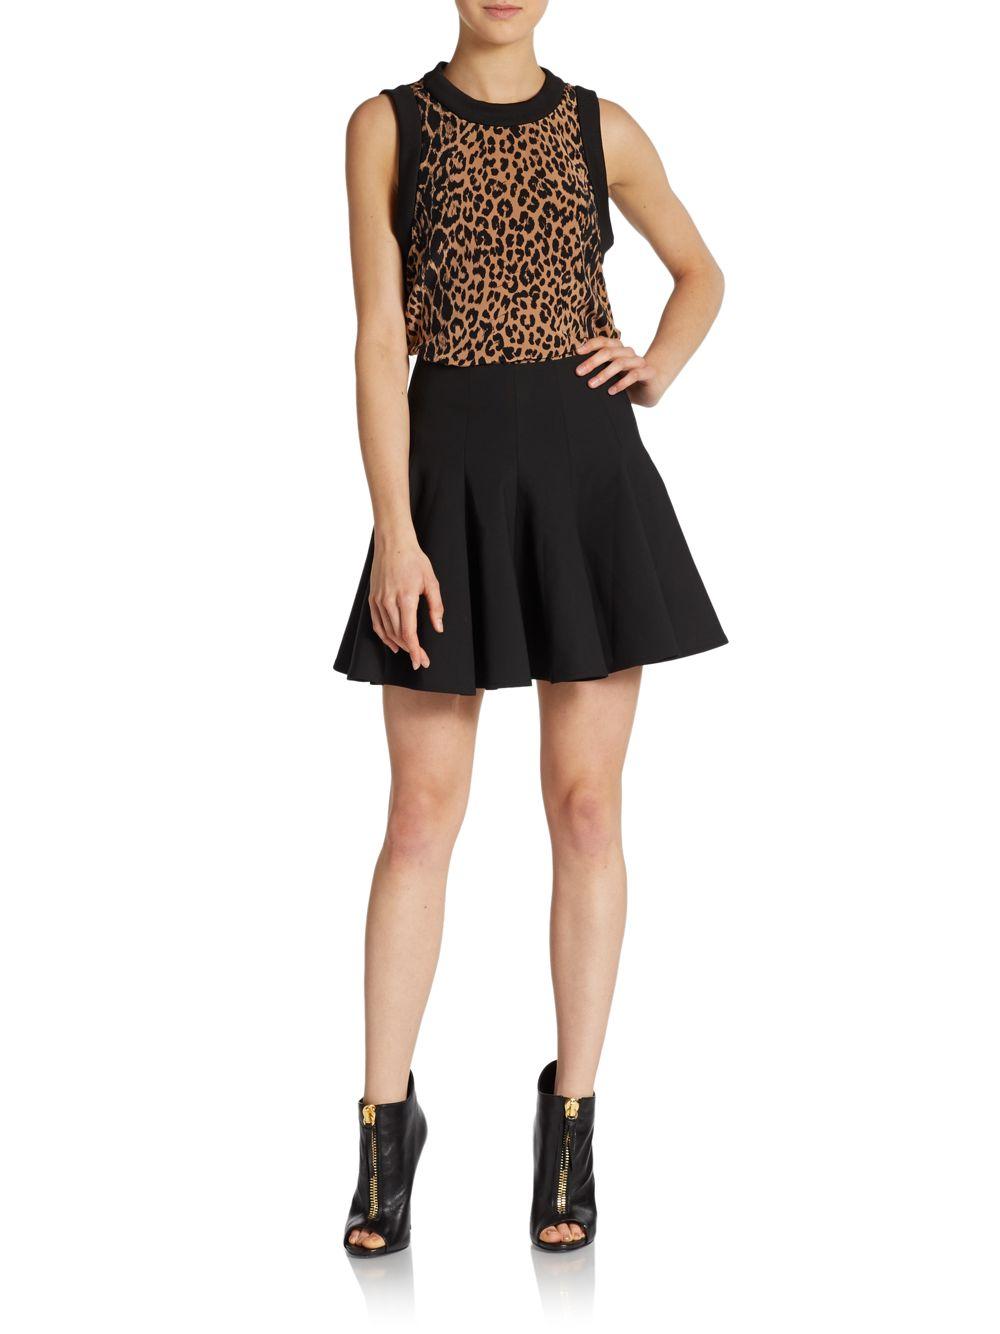 cfbbe91656fb Elizabeth and James Vivi Leopard-Print Silk Top - Lyst